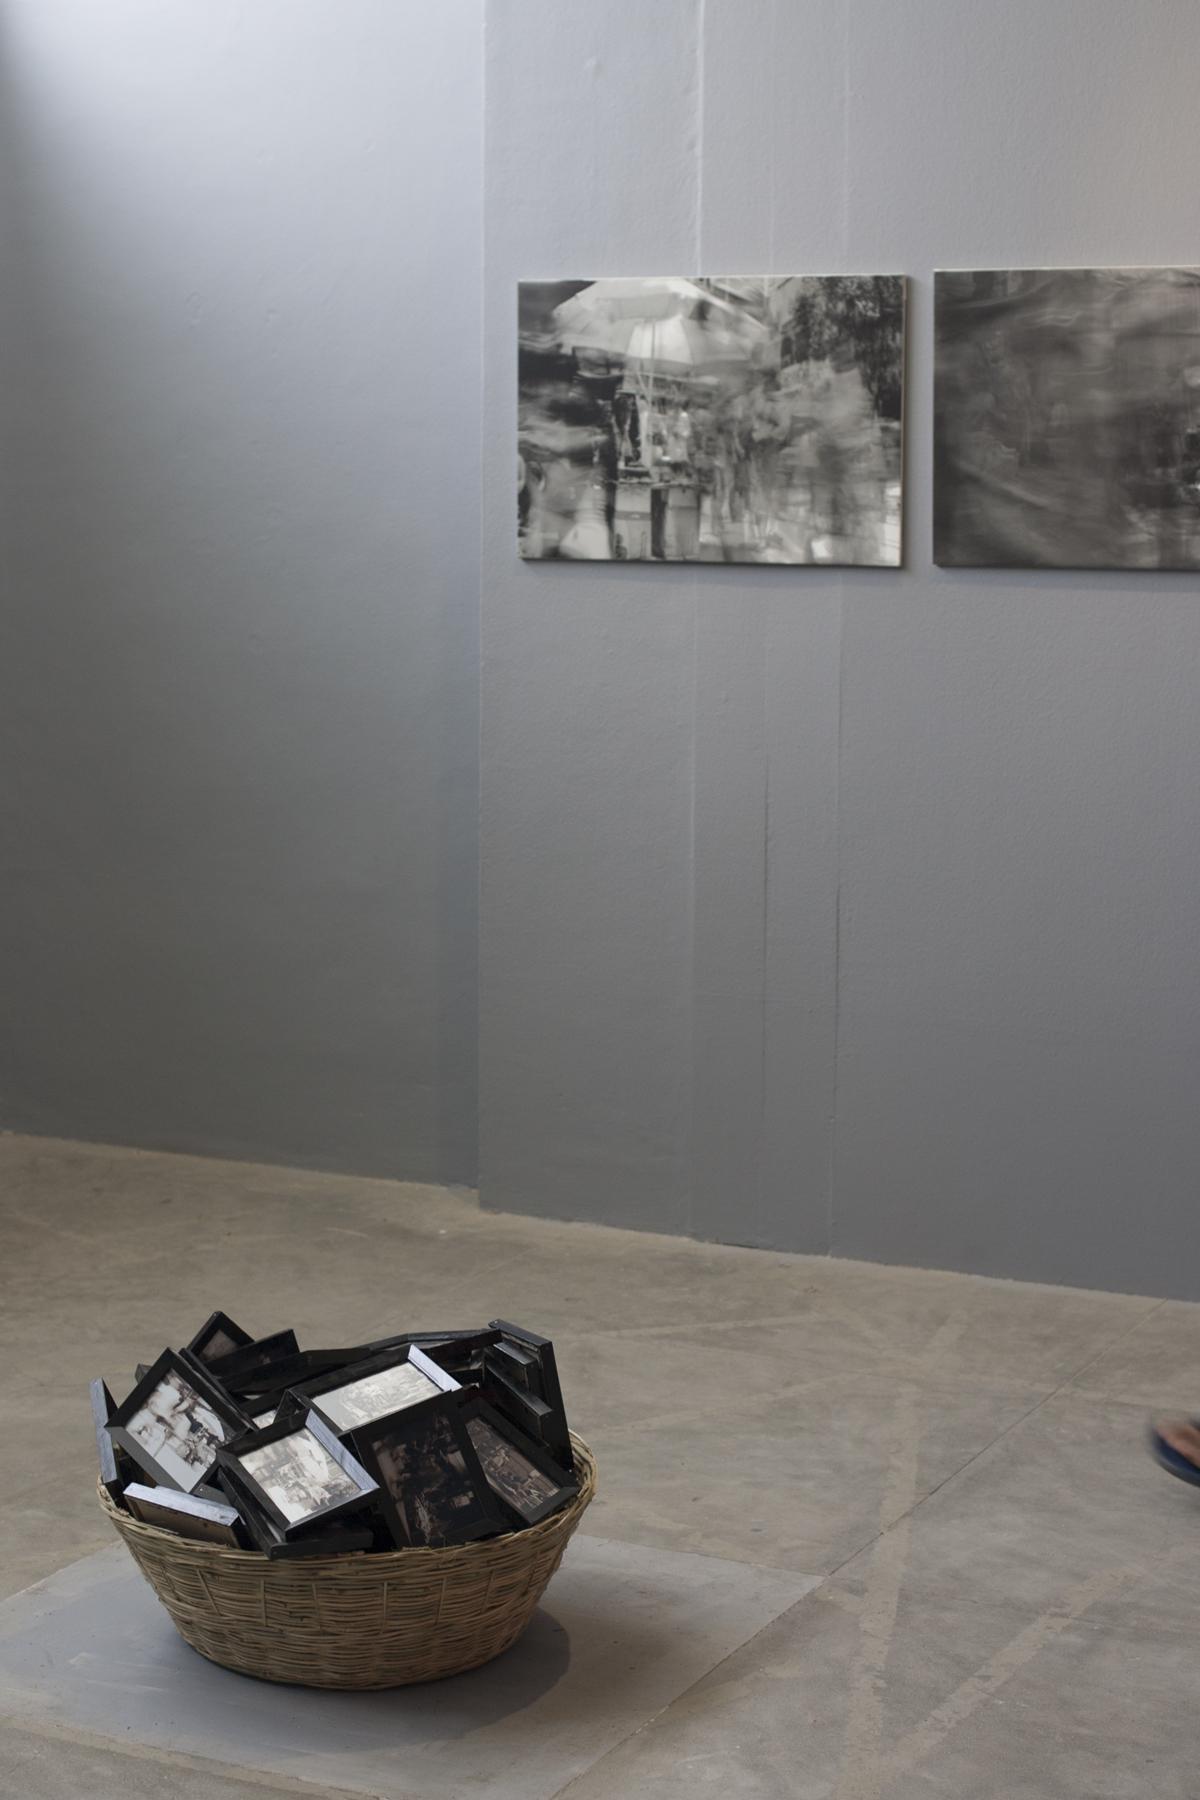 Artudio_KUart_BFA_Exhibition Project16 (6)